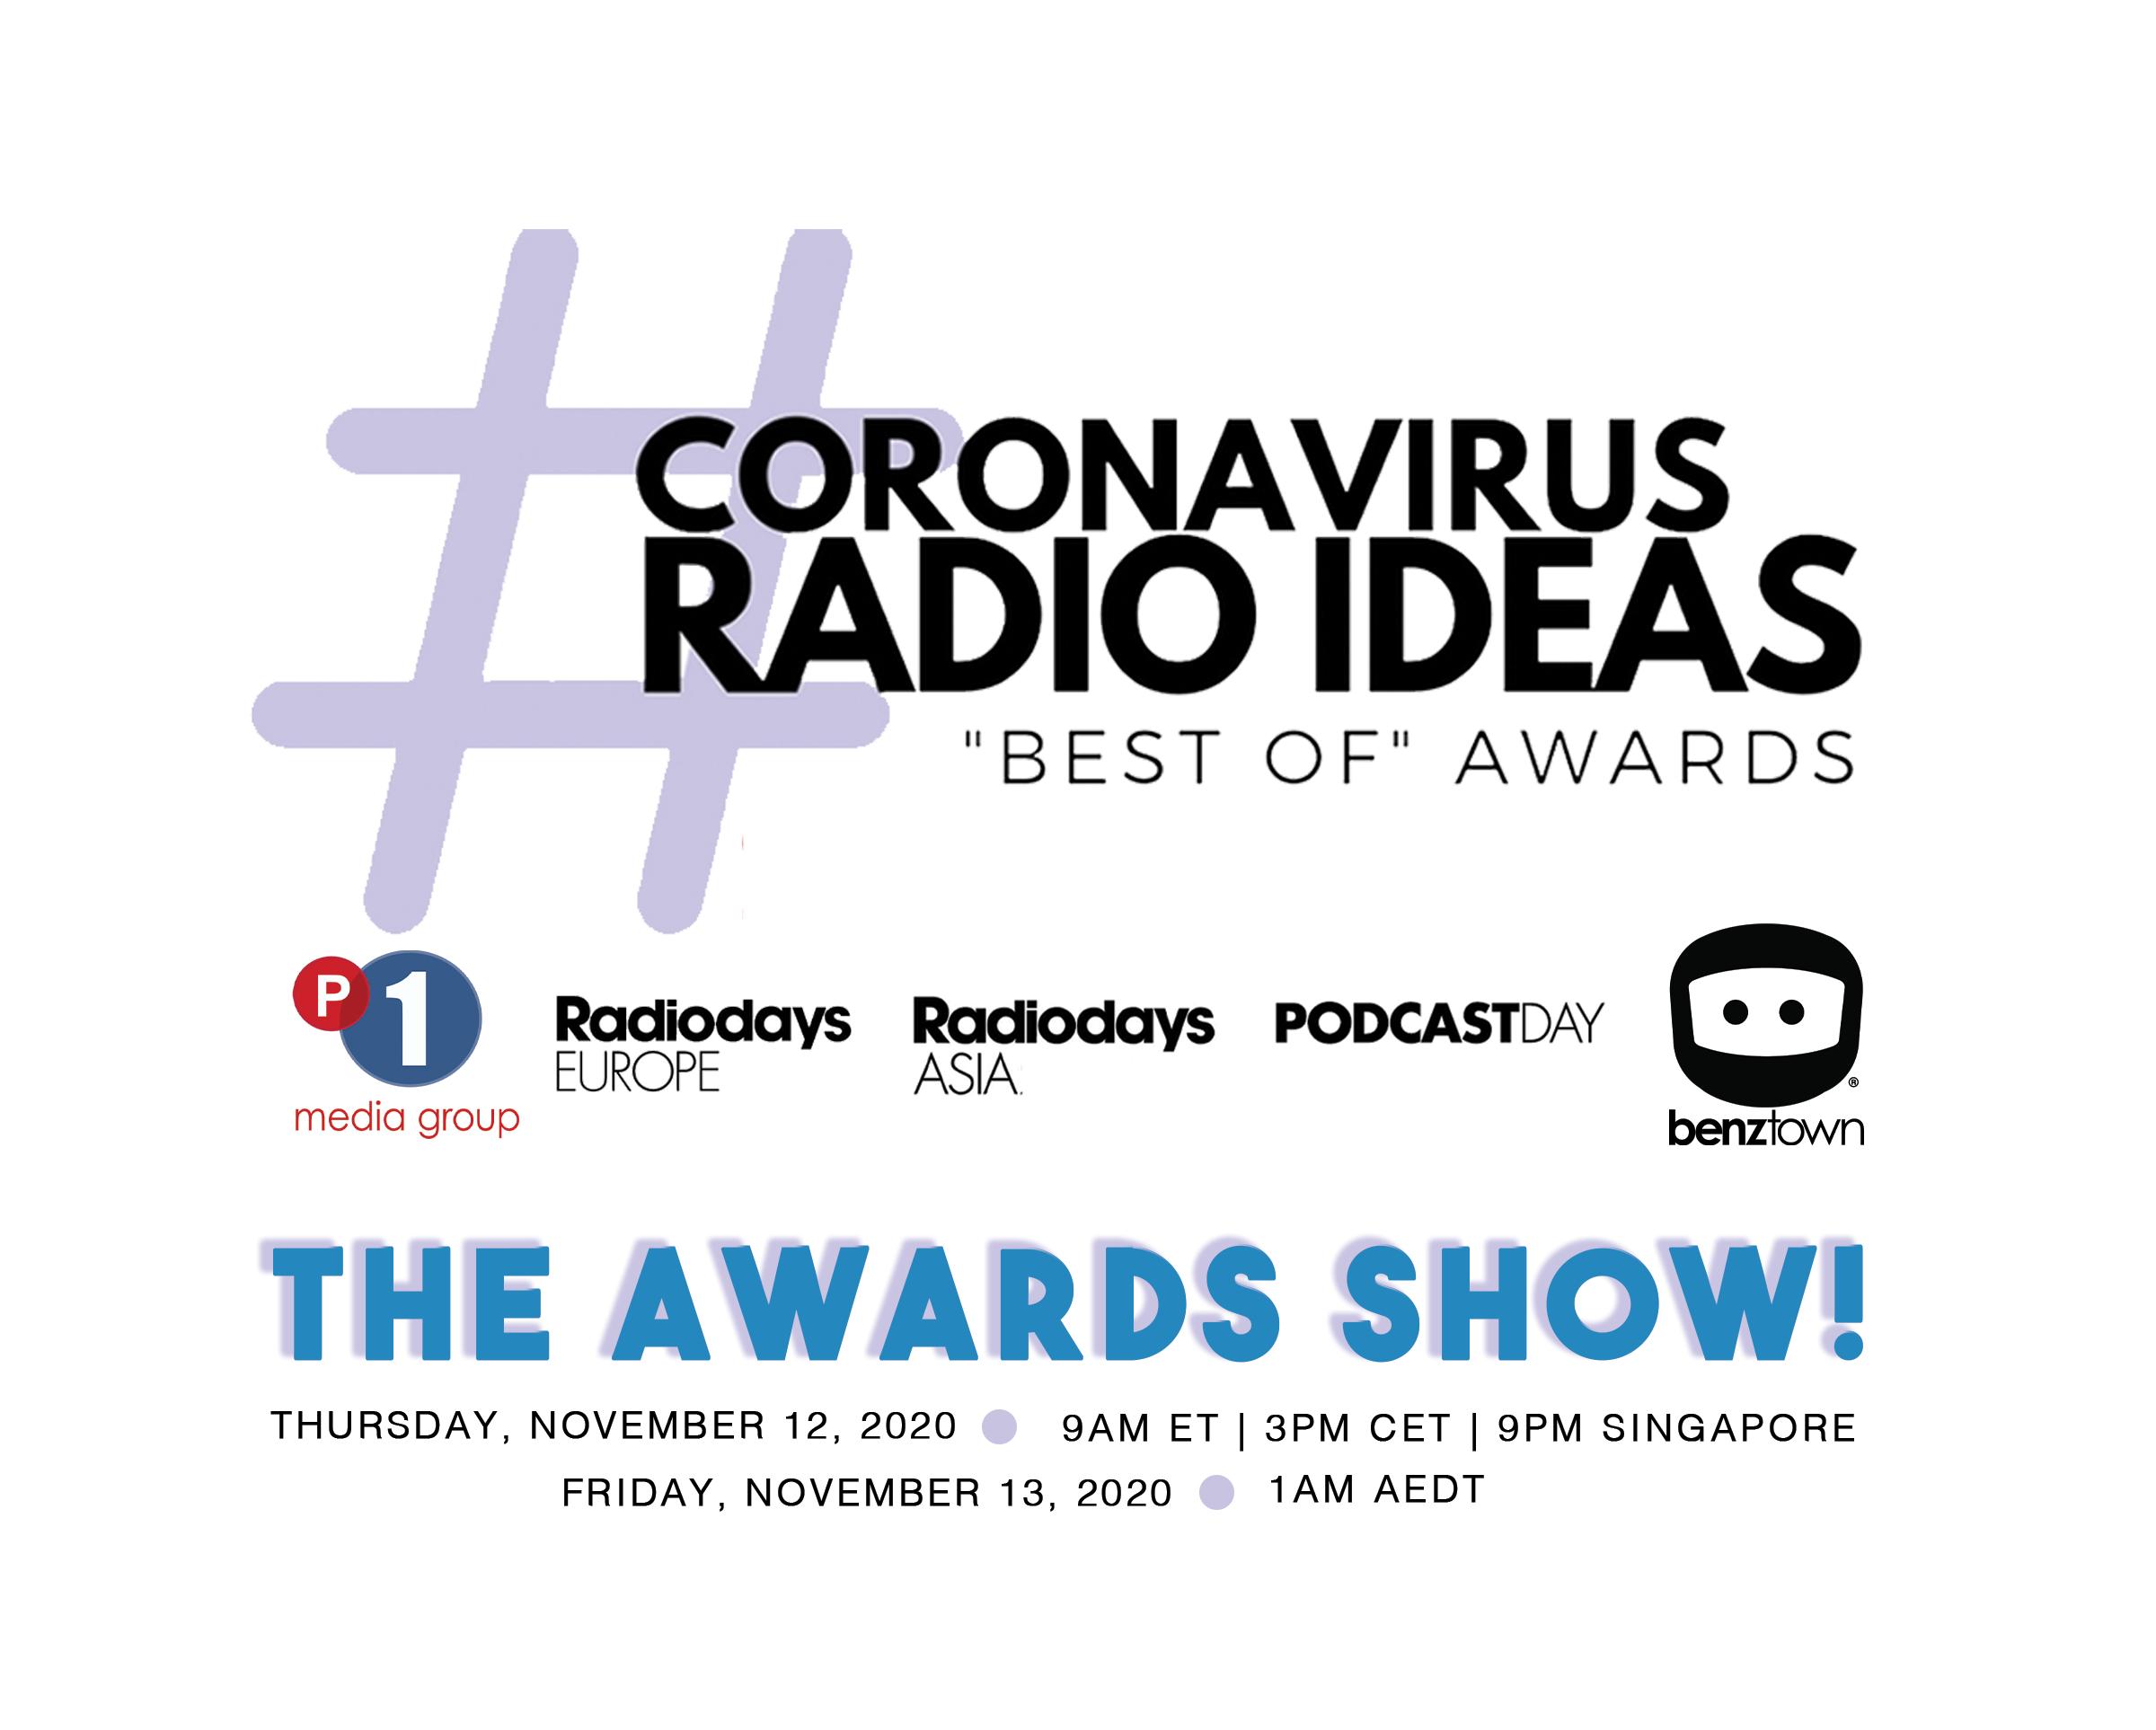 Coronavirus Radio Ideas Awards Show